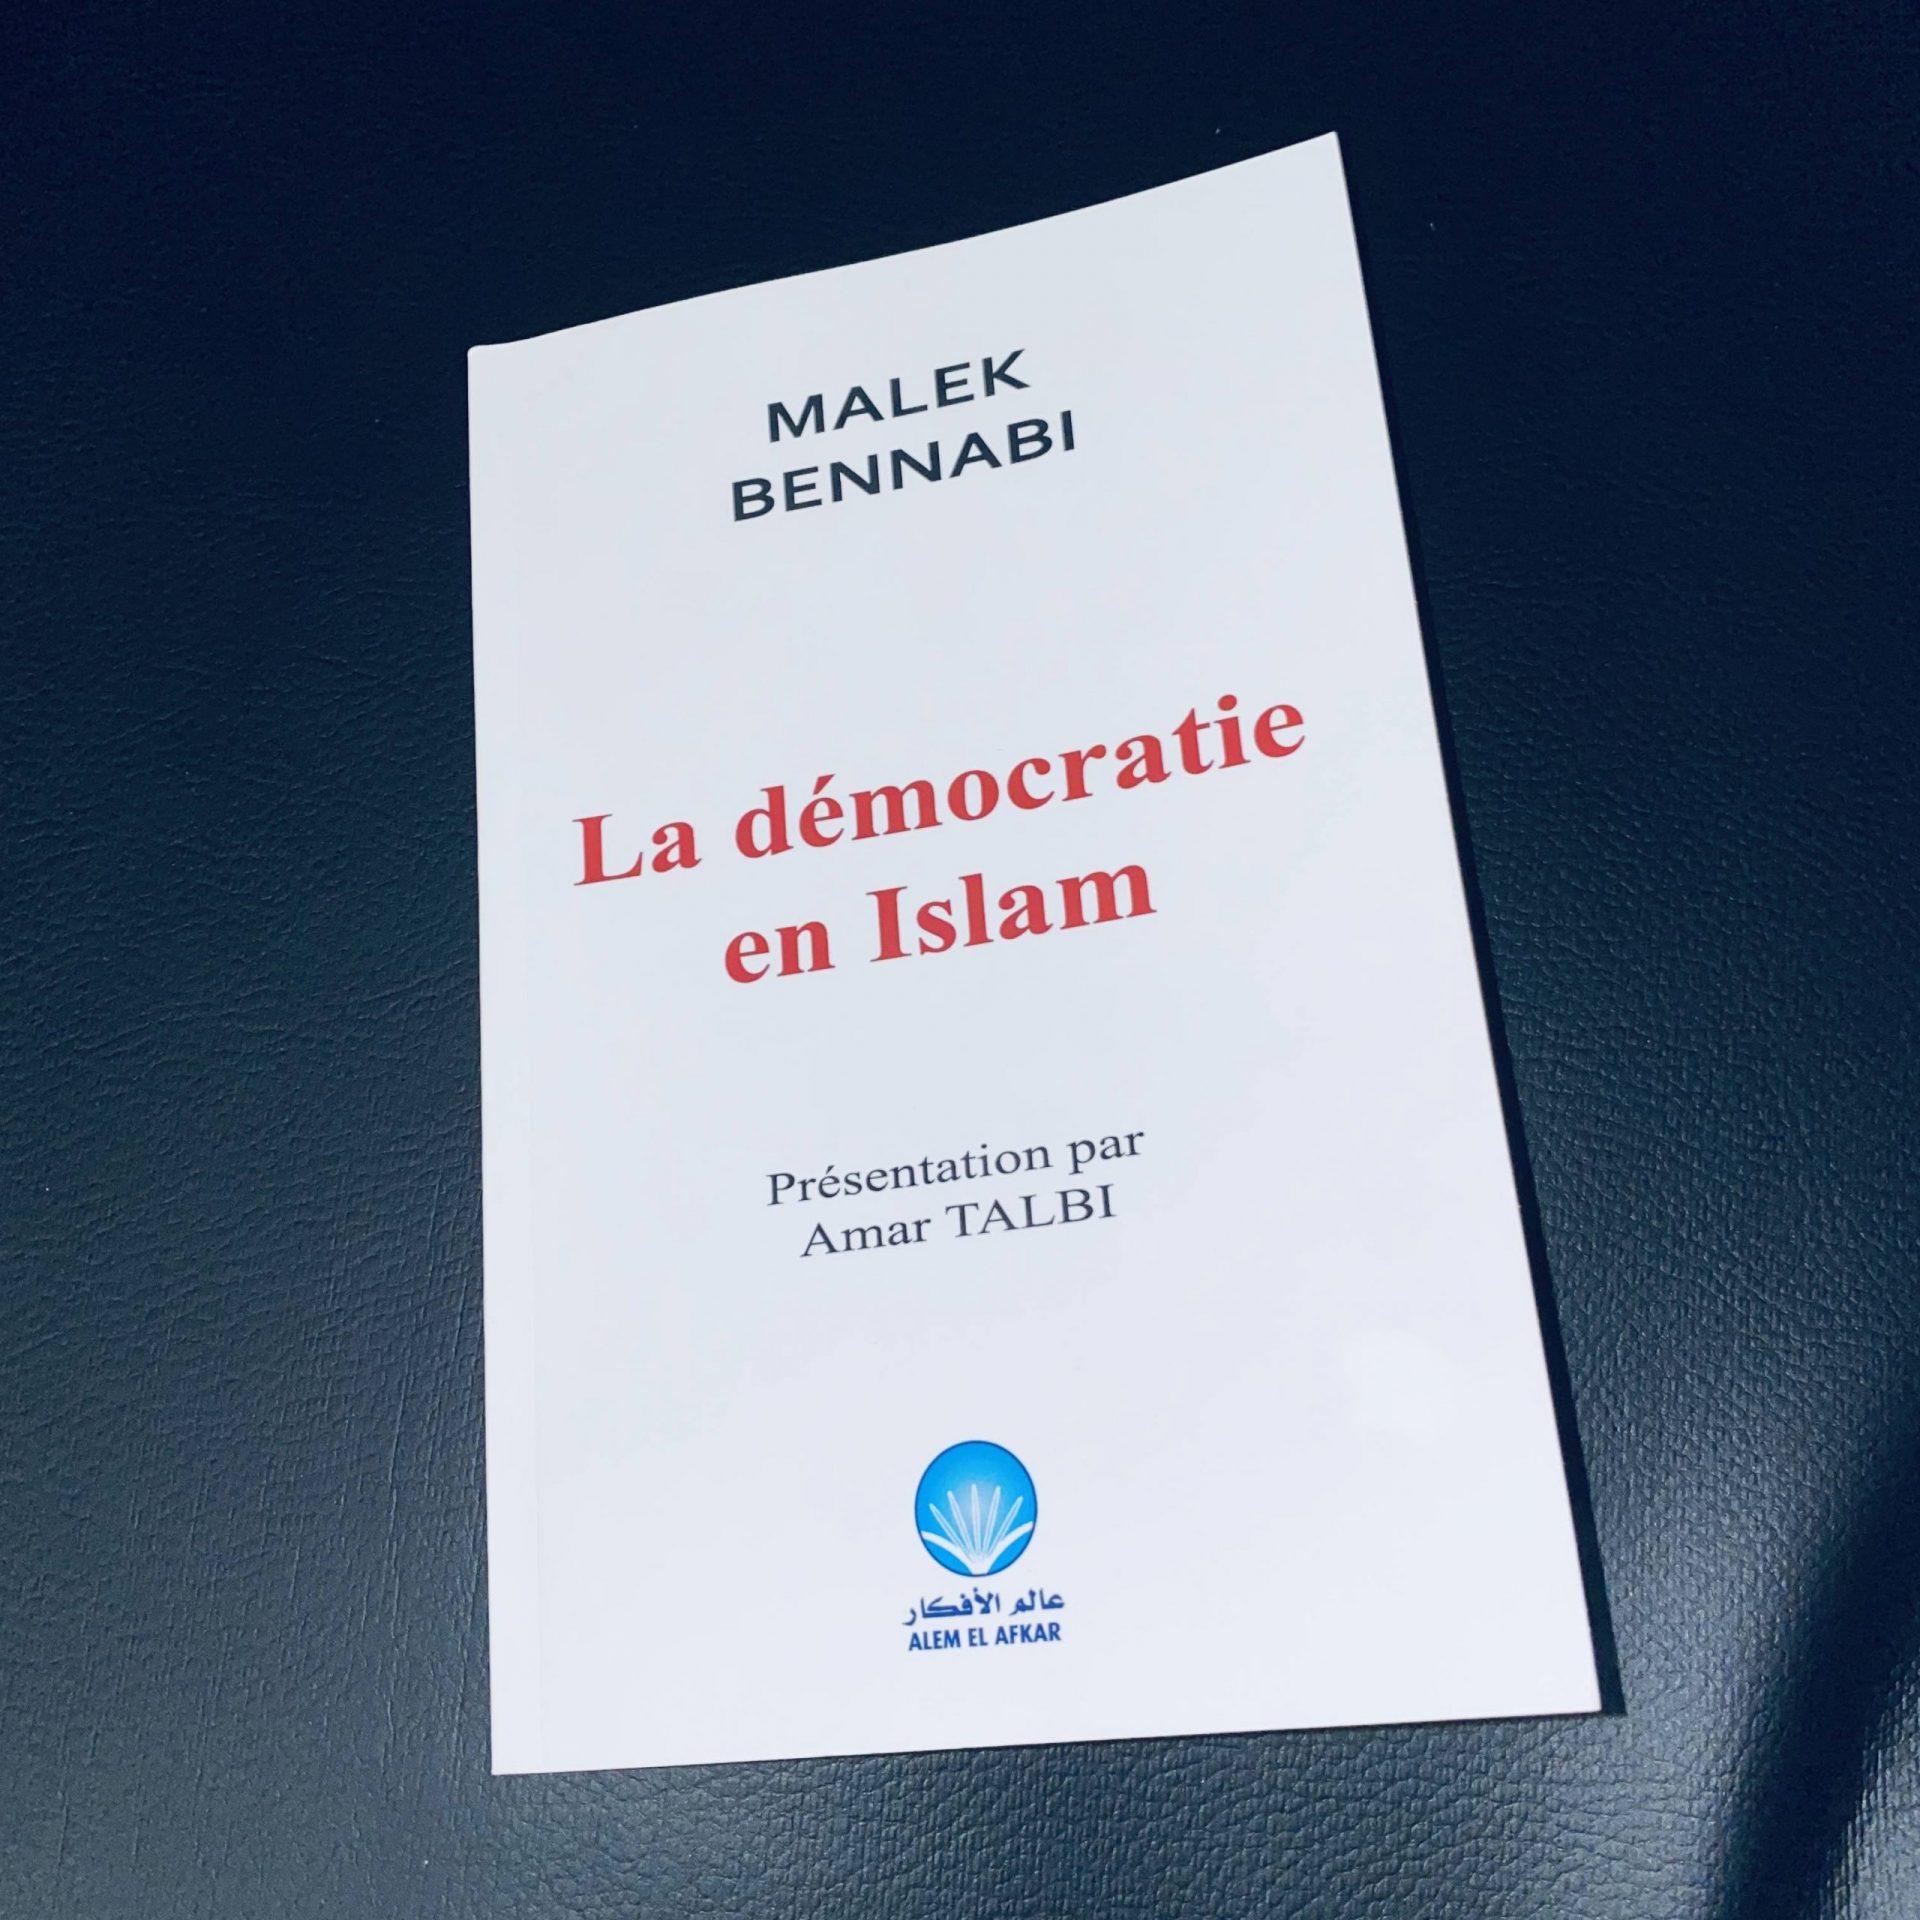 La démocratie en islam – Malek Bennabi [Compte rendu]